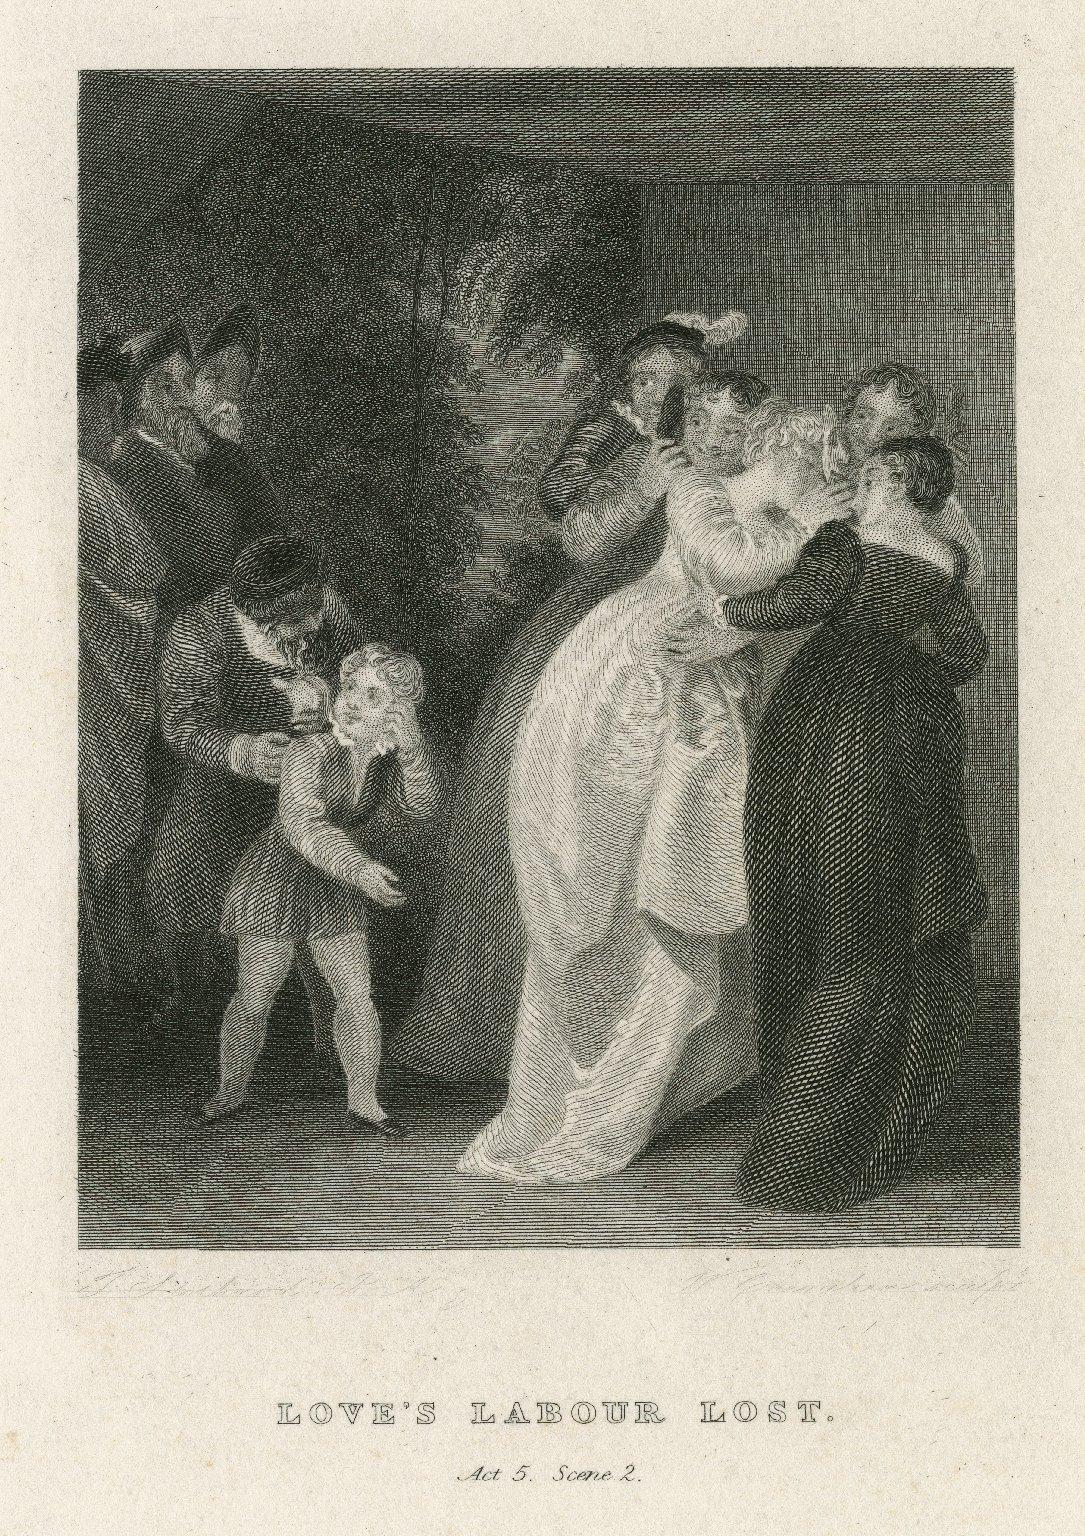 Love's labour lost, act 5, scene 2 [graphic] / T. Stothard R.A. delt. ; W. Chevalier sculps.